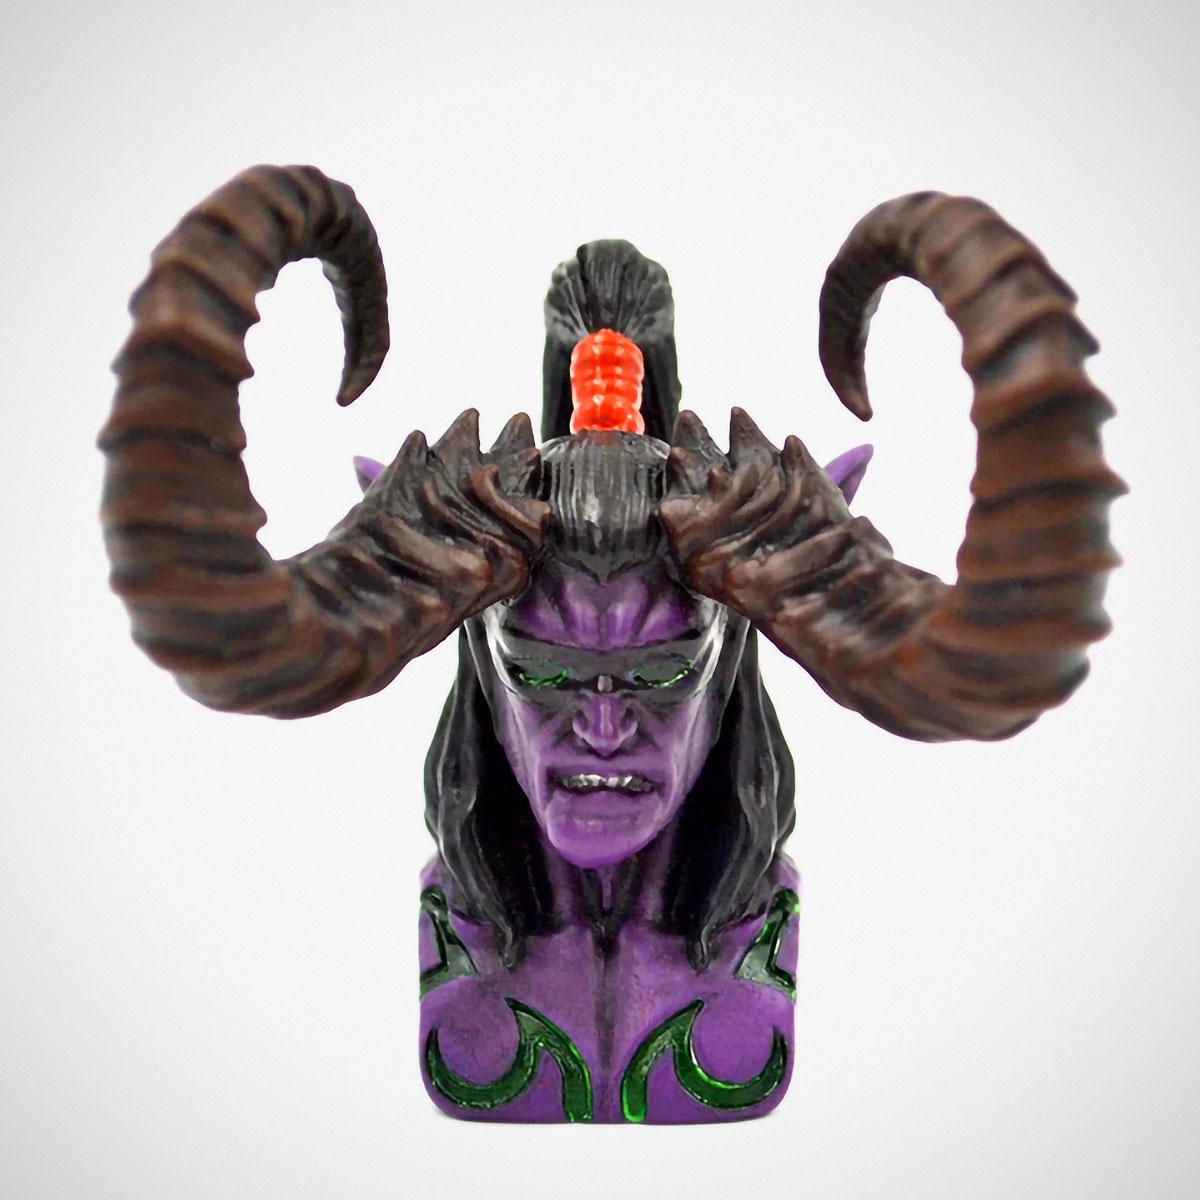 World of Warcraft Illidan Design Resin Backlit Keycap